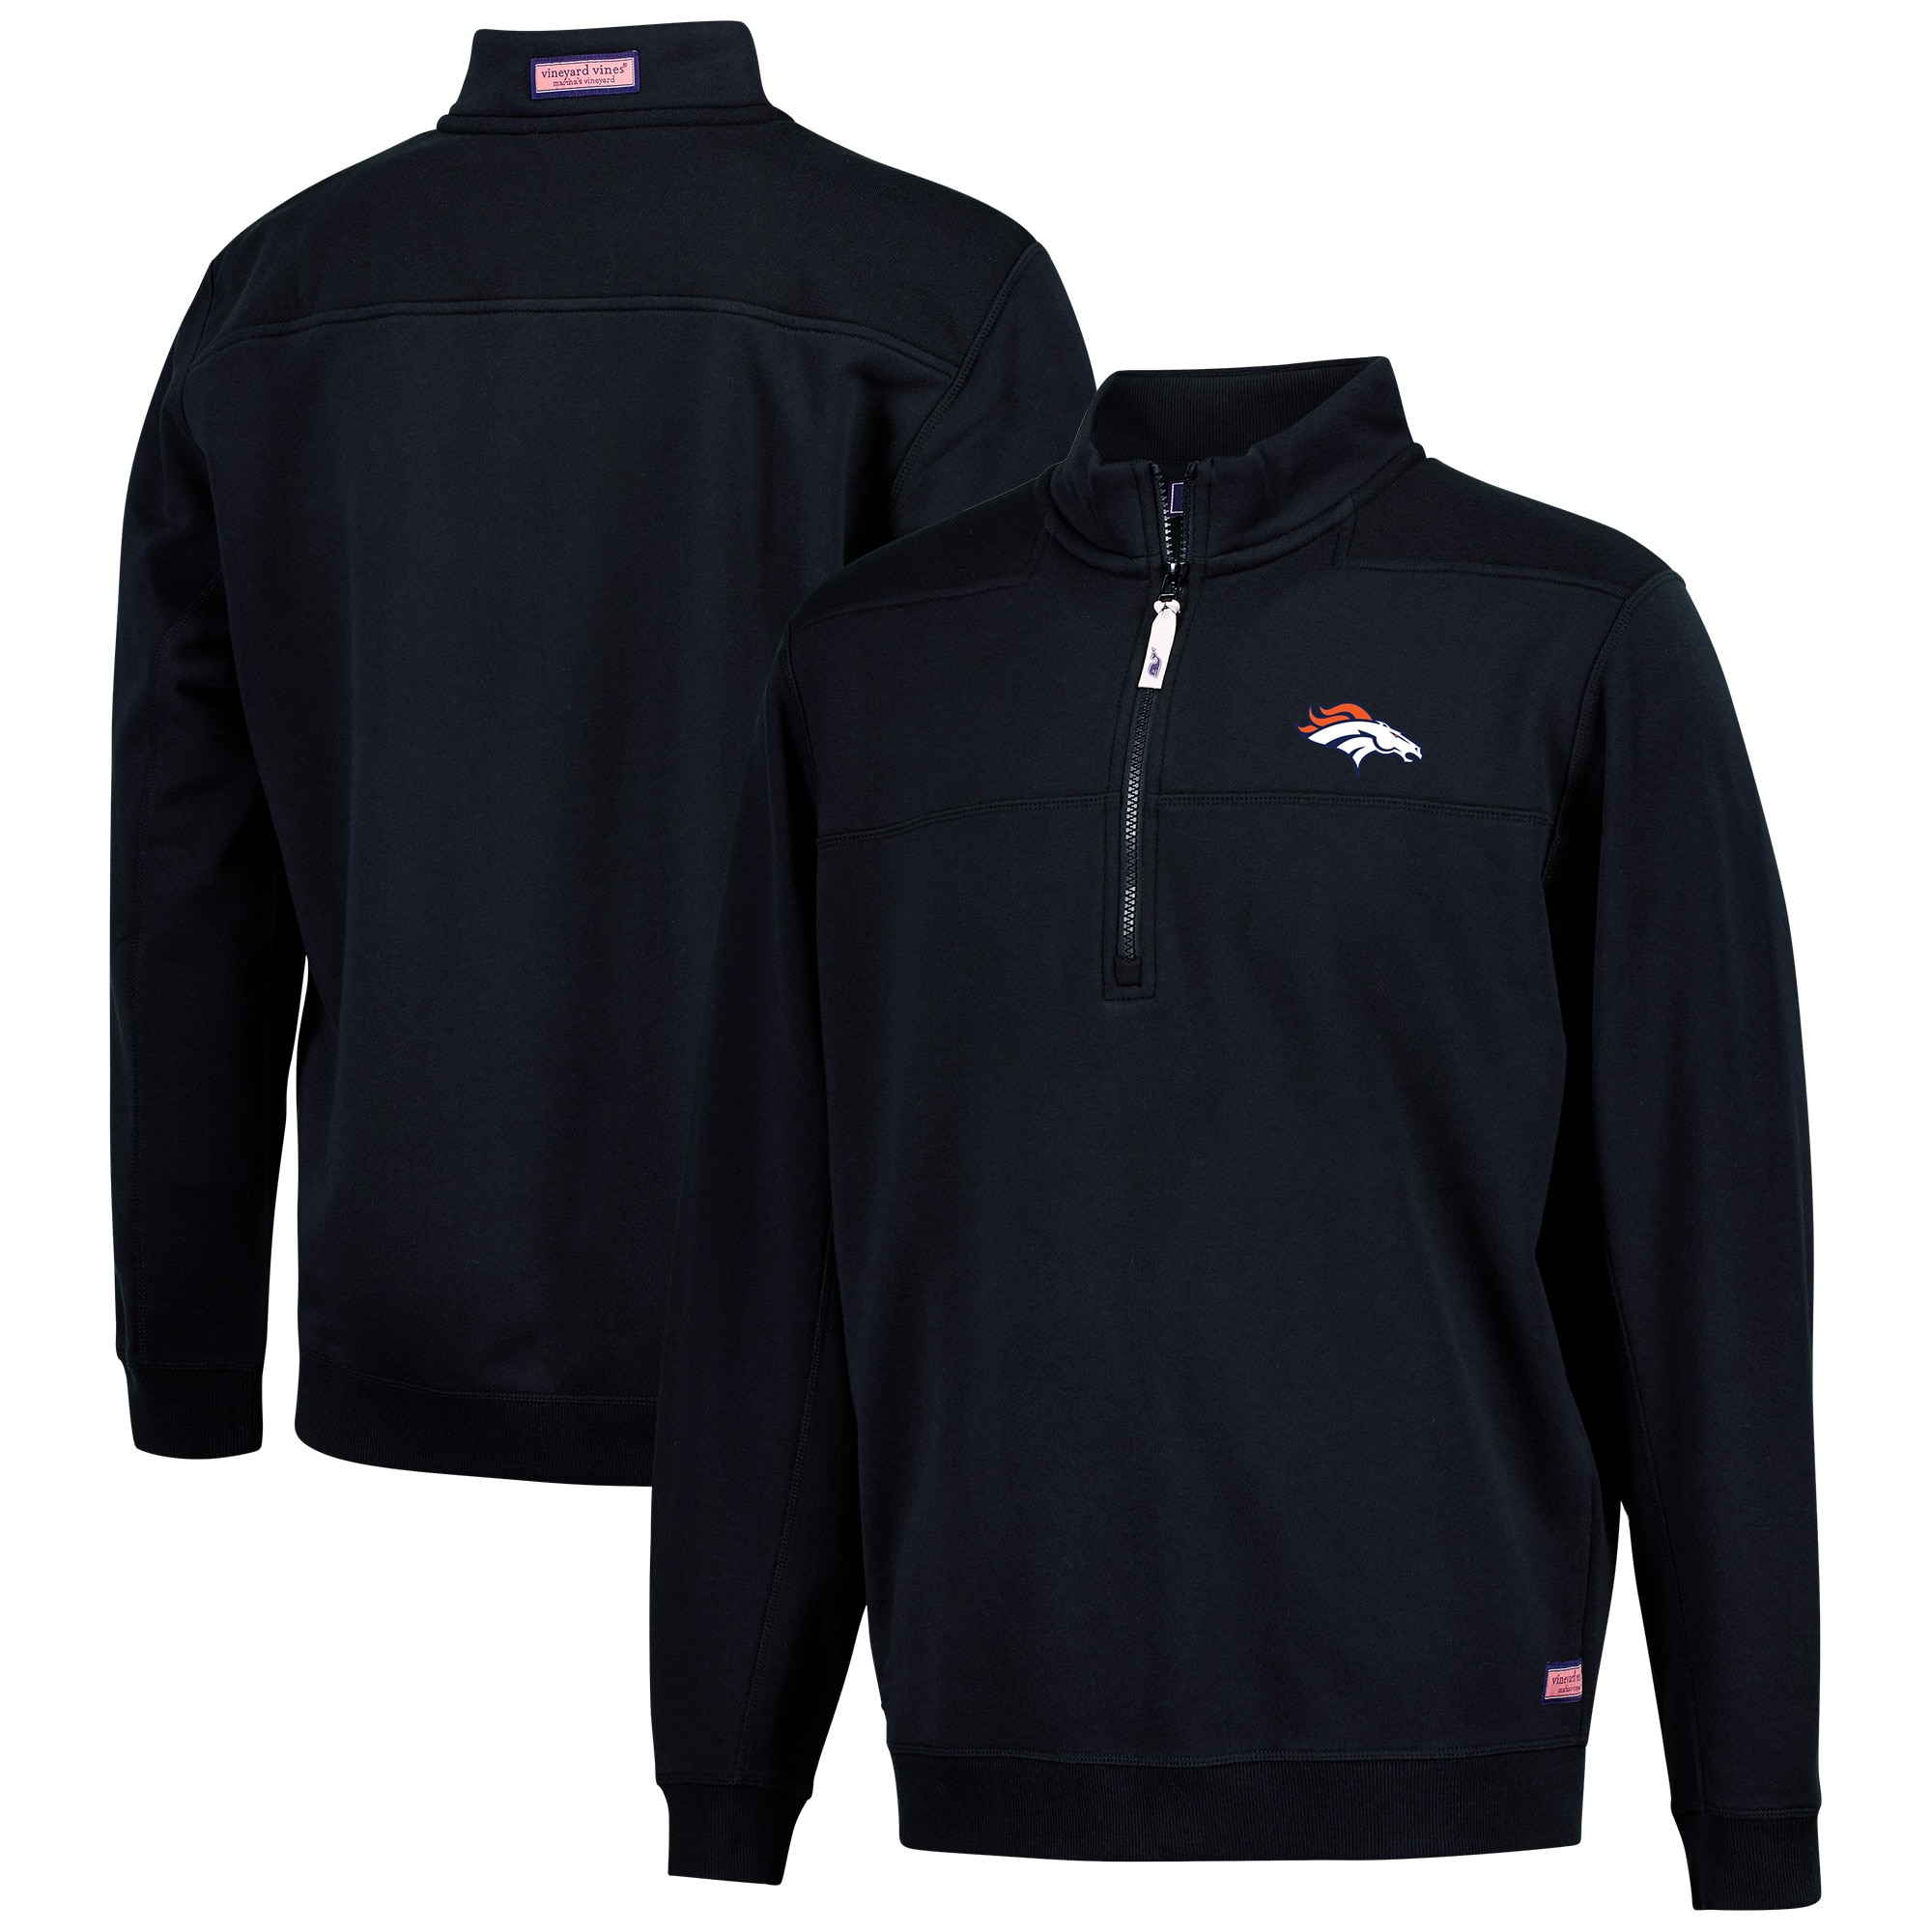 Denver Broncos Vineyard Vines Collegiate Shep Shirt Quarter-Zip Pullover Jacket - Navy